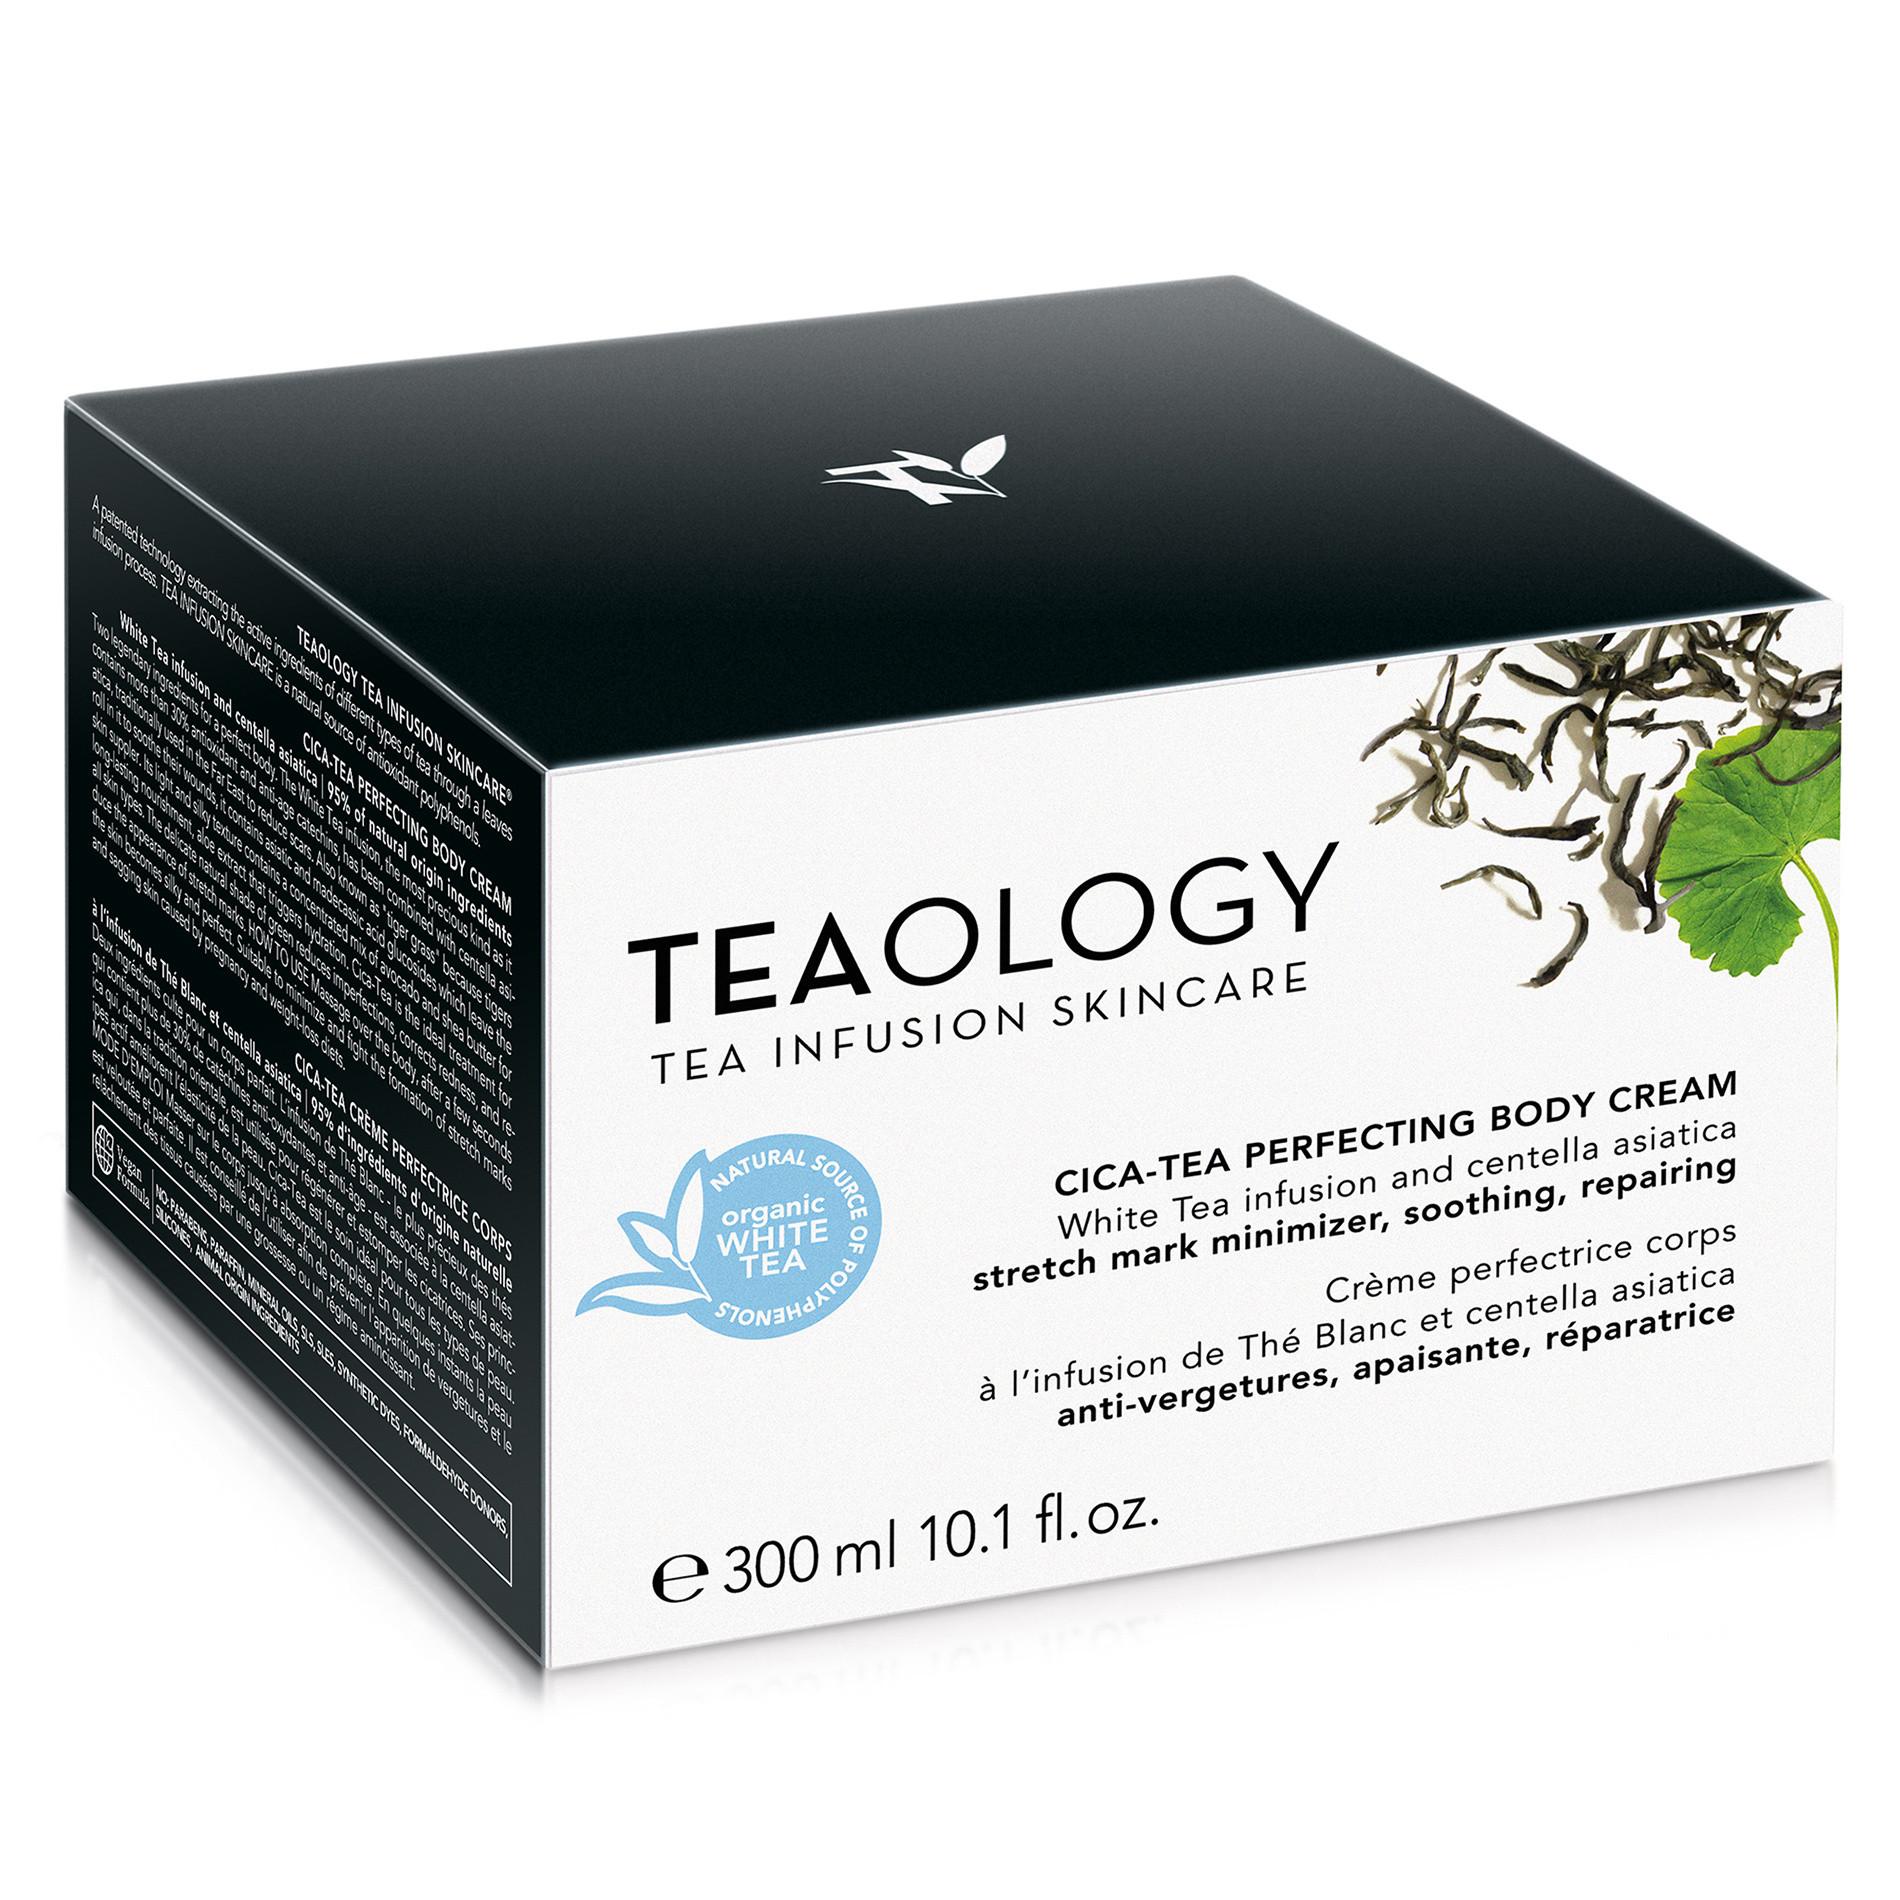 Teaolgy Cica-Tea Perfecting Body Cream 300 ml, Bianco, large image number 0